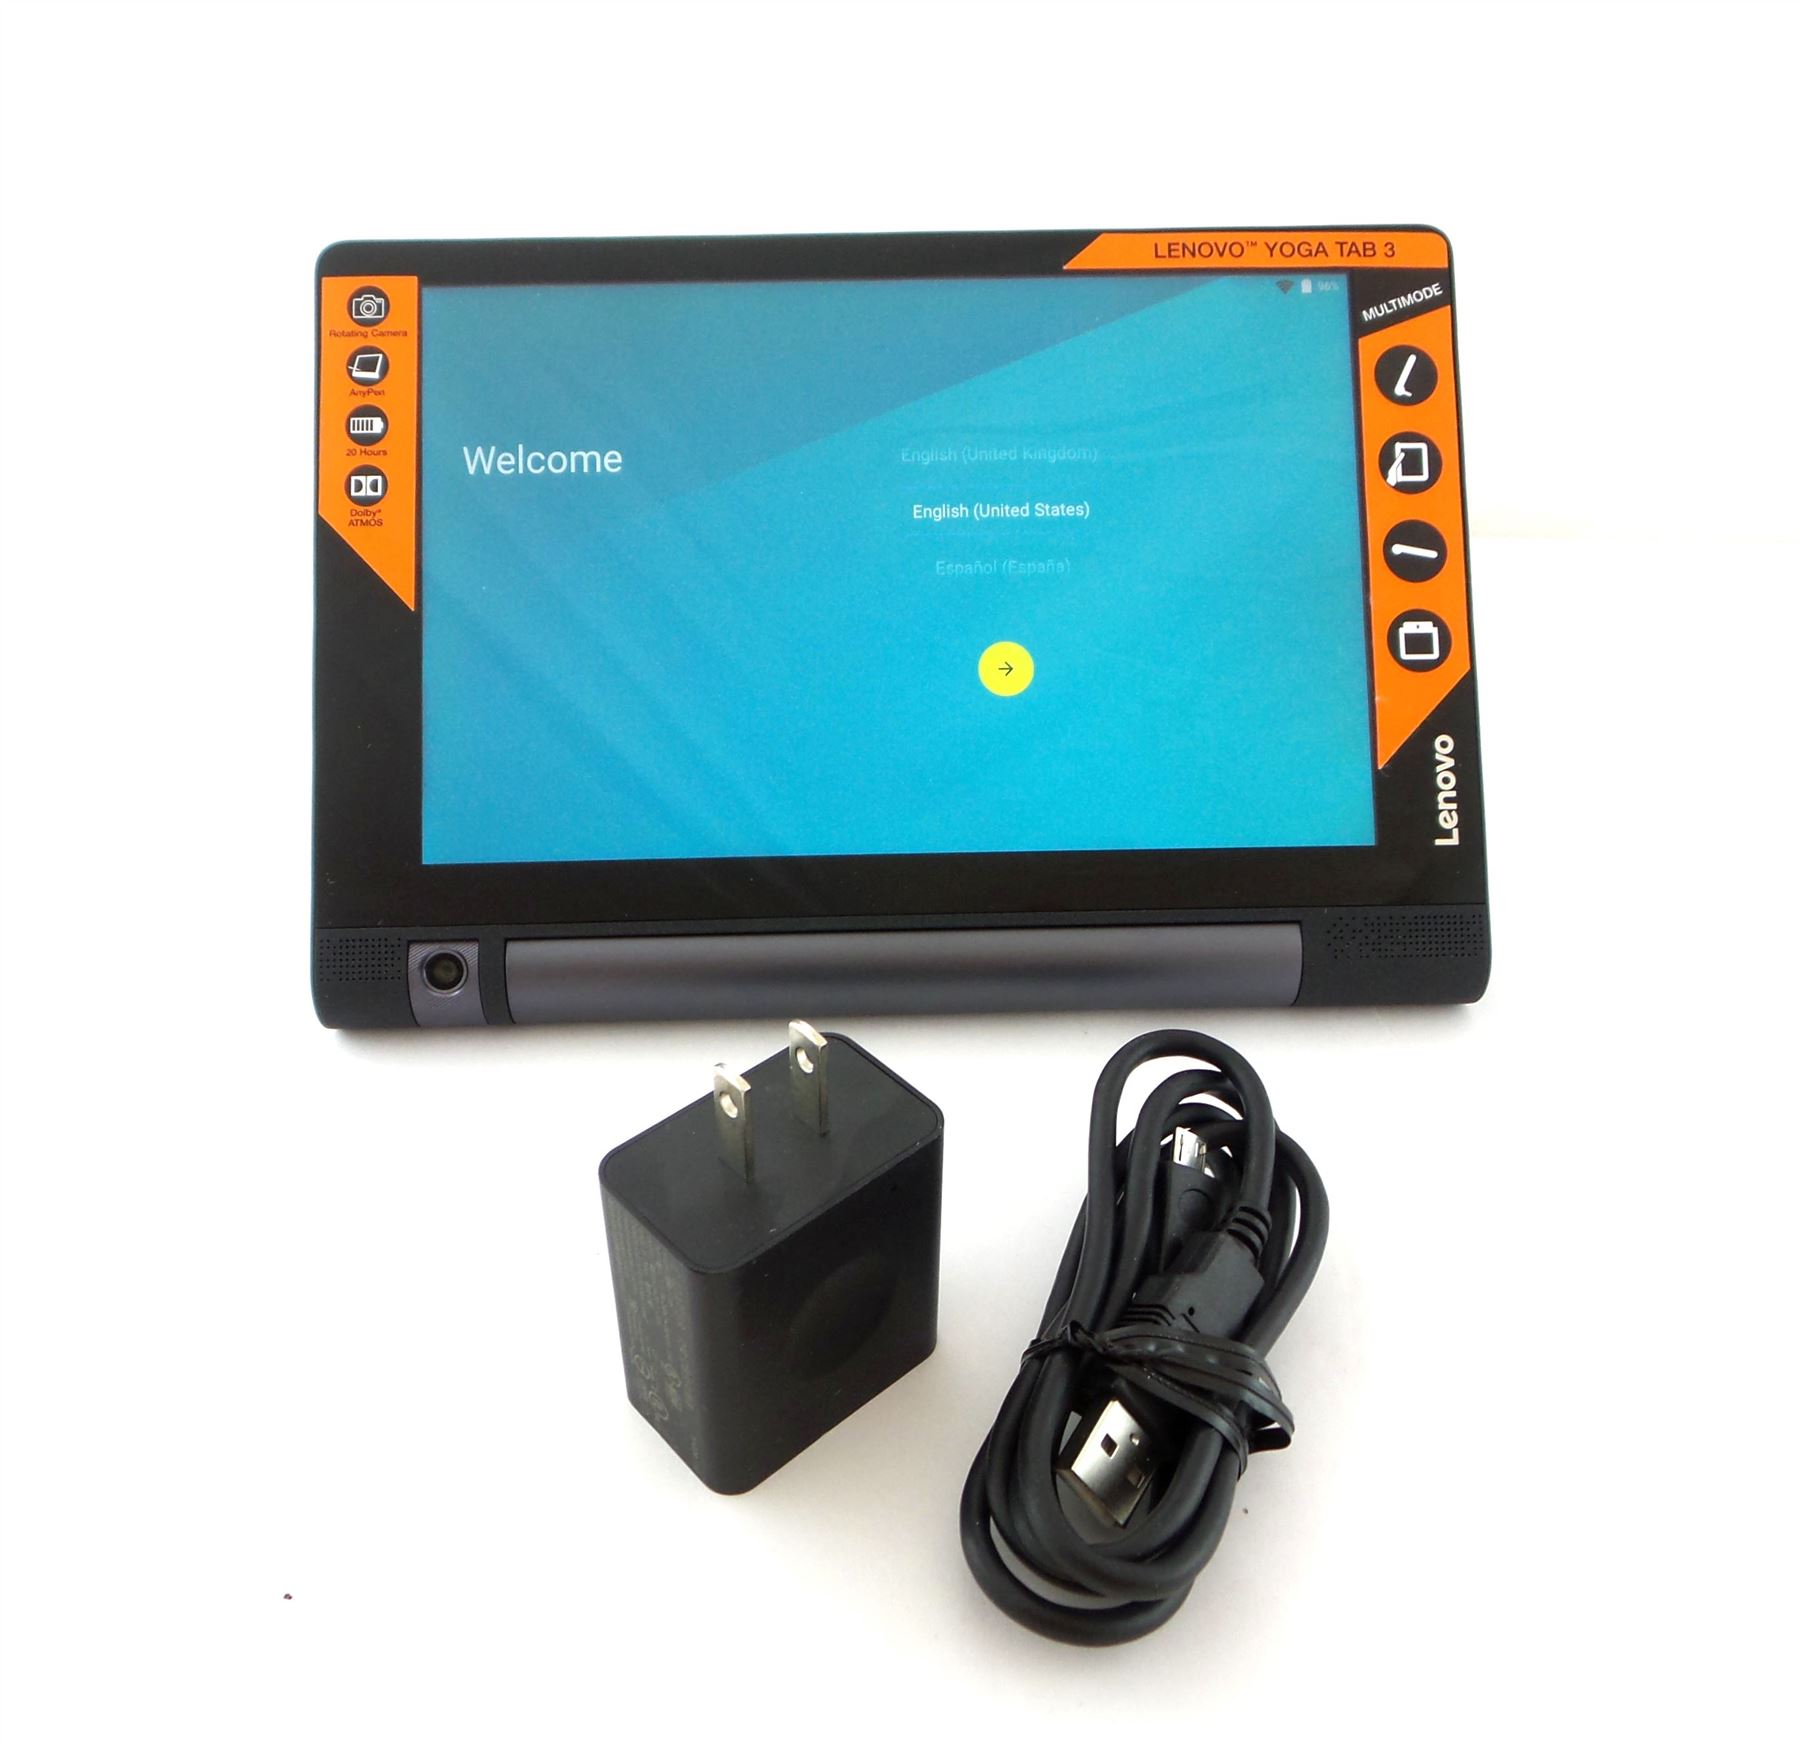 lenovo yoga tab 3 8 tablet 16gb wifi 8mp android black za090008us ebay. Black Bedroom Furniture Sets. Home Design Ideas